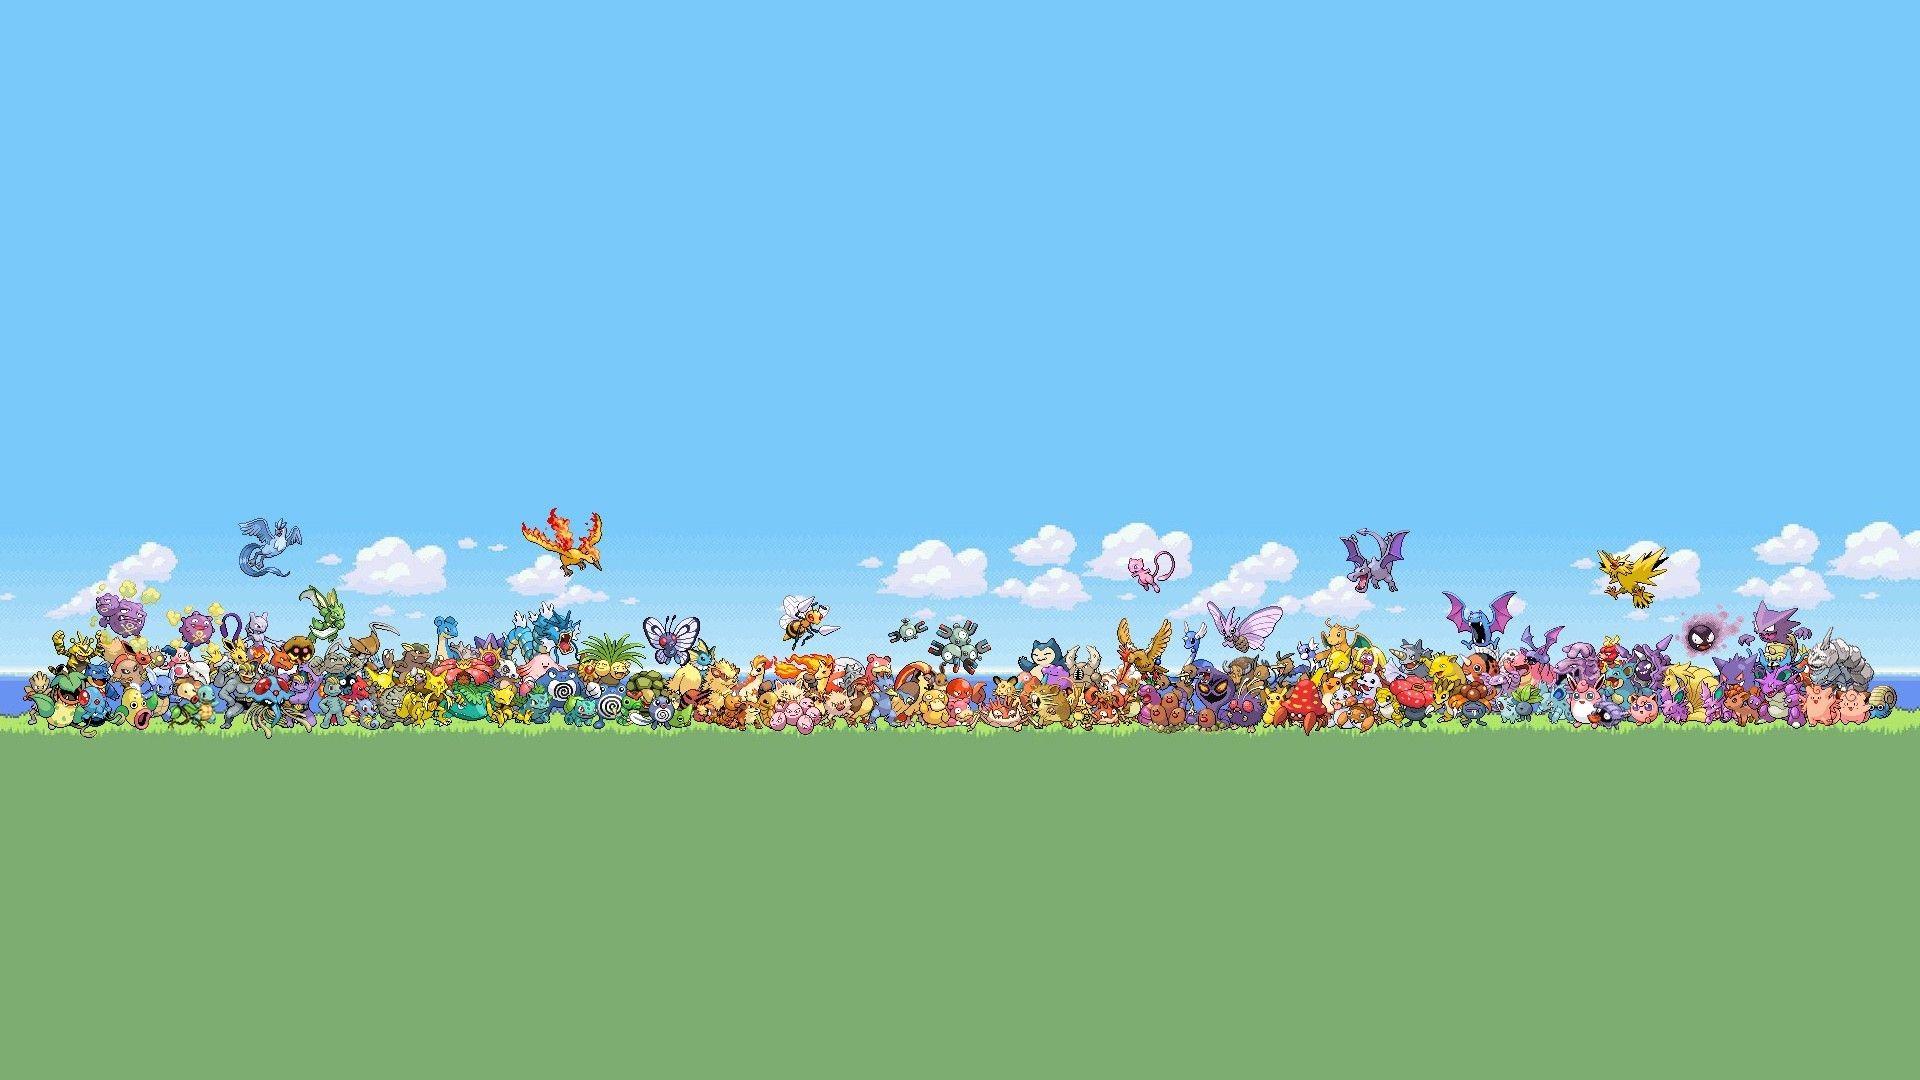 Res: 1920x1080, #Retro #Pokemon [Gaming • Nature • Movies/Shows] #desktop #